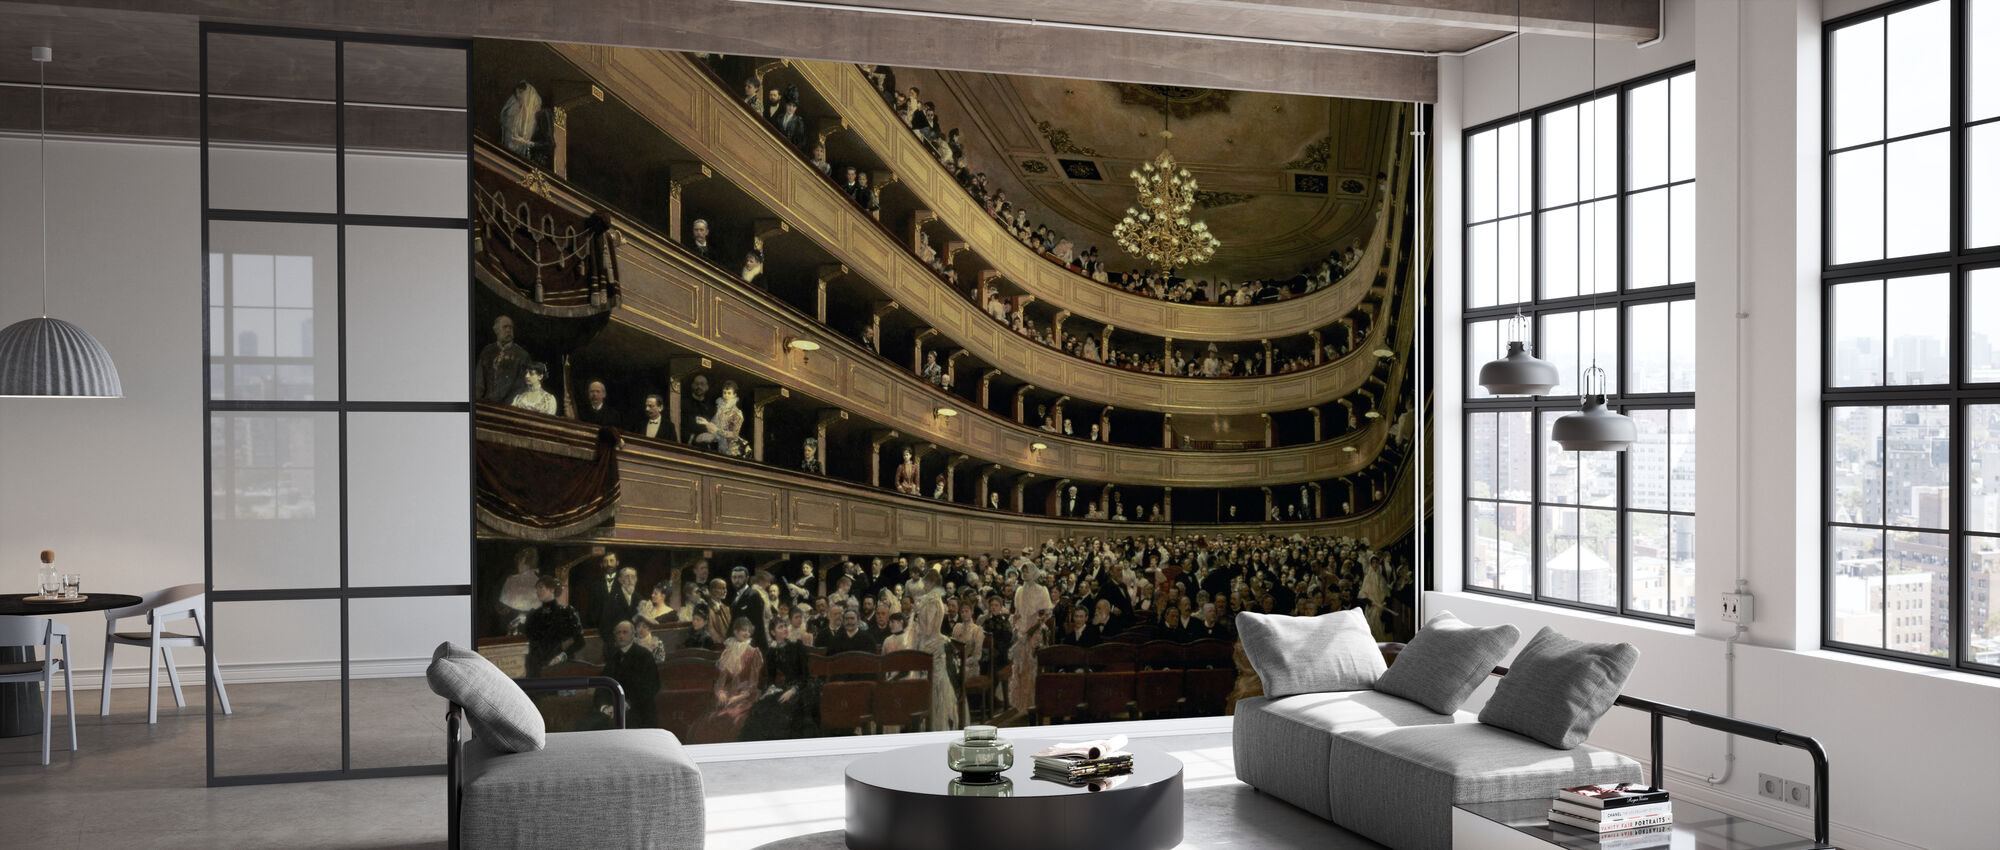 Old Castle Theatre - Gustav Klimt - Wallpaper - Office